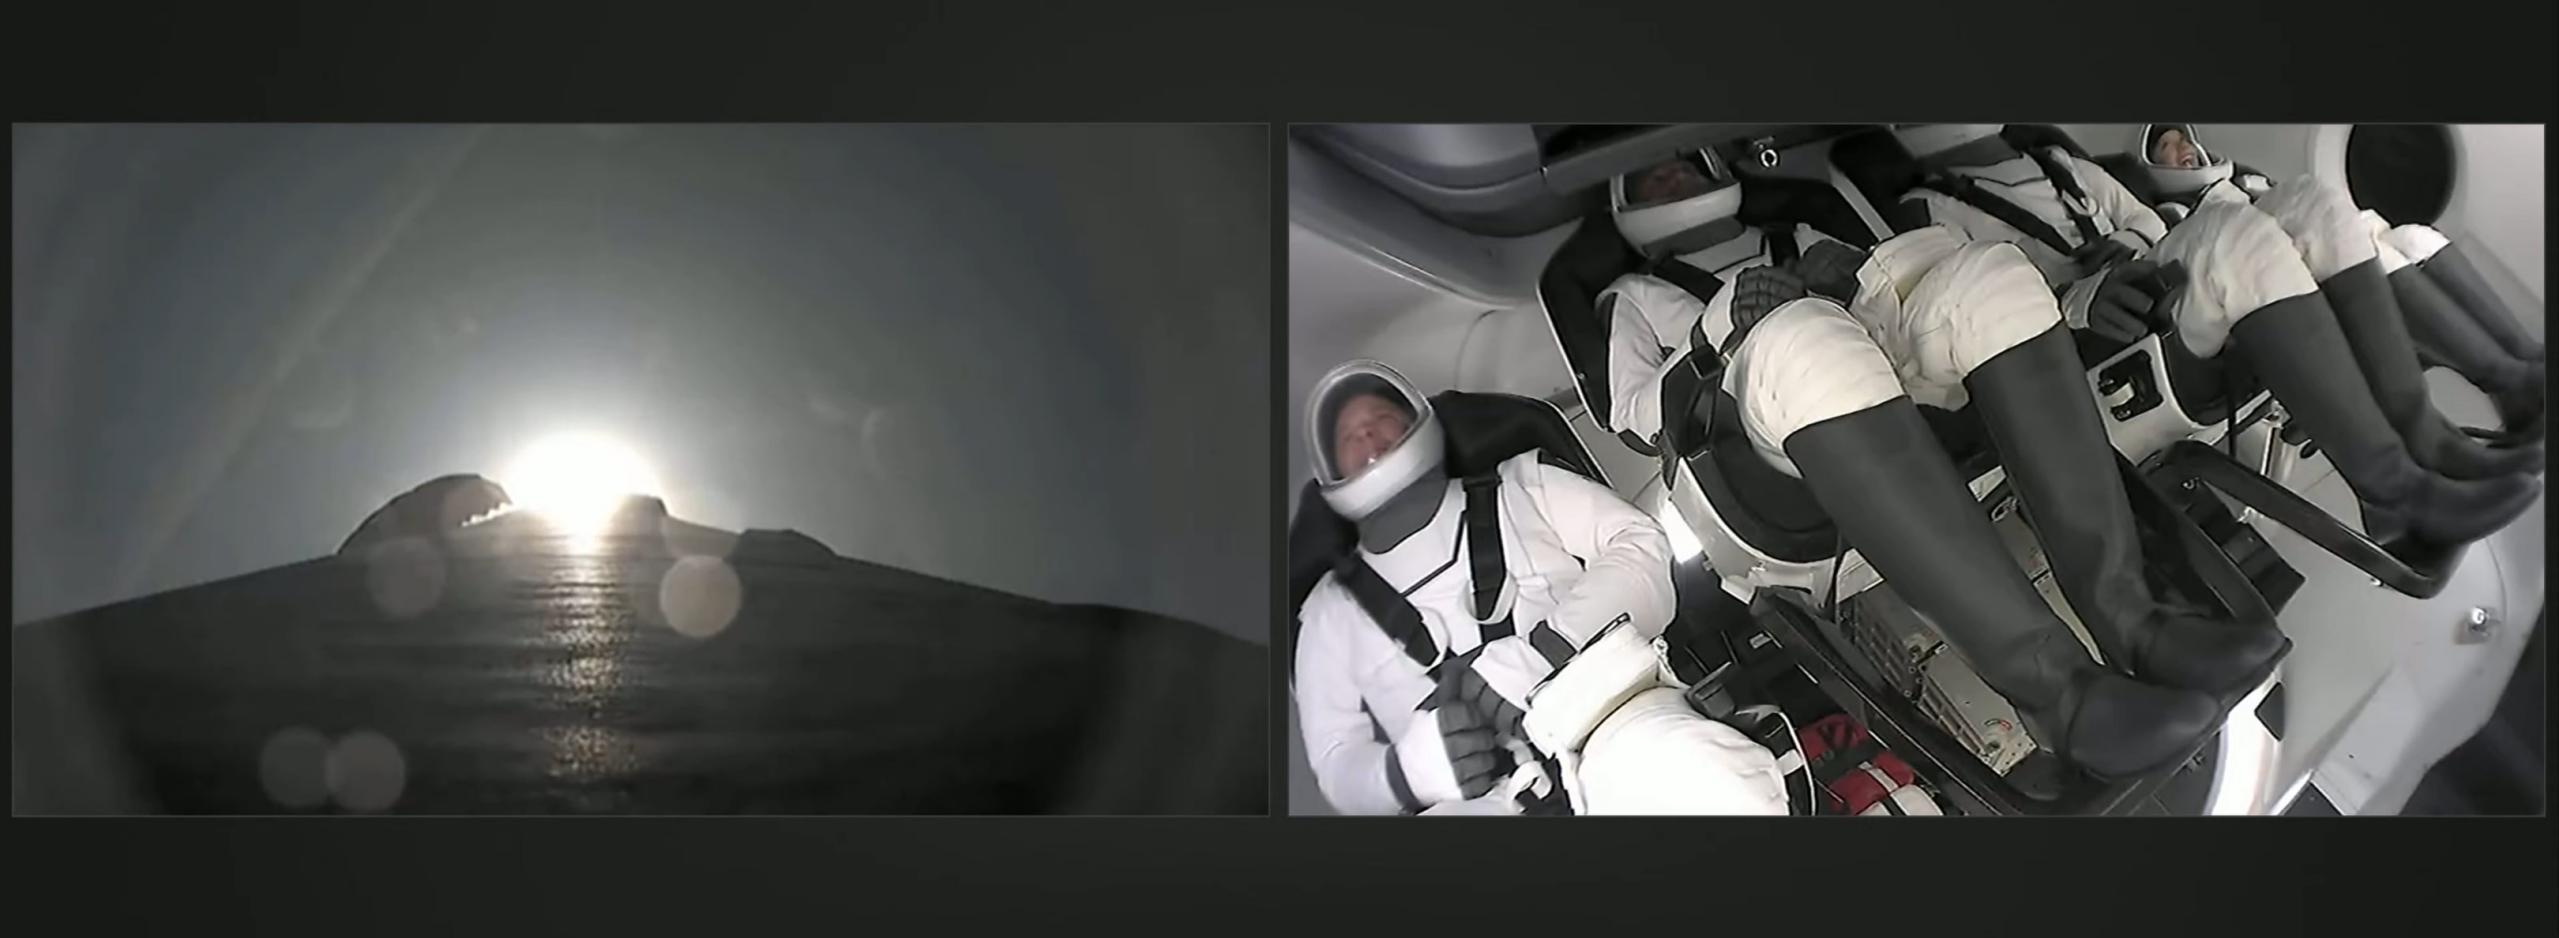 Inspiration4 Dragon C207 F9 B1062 091521 webcast (SpaceX) launch 1 (c)